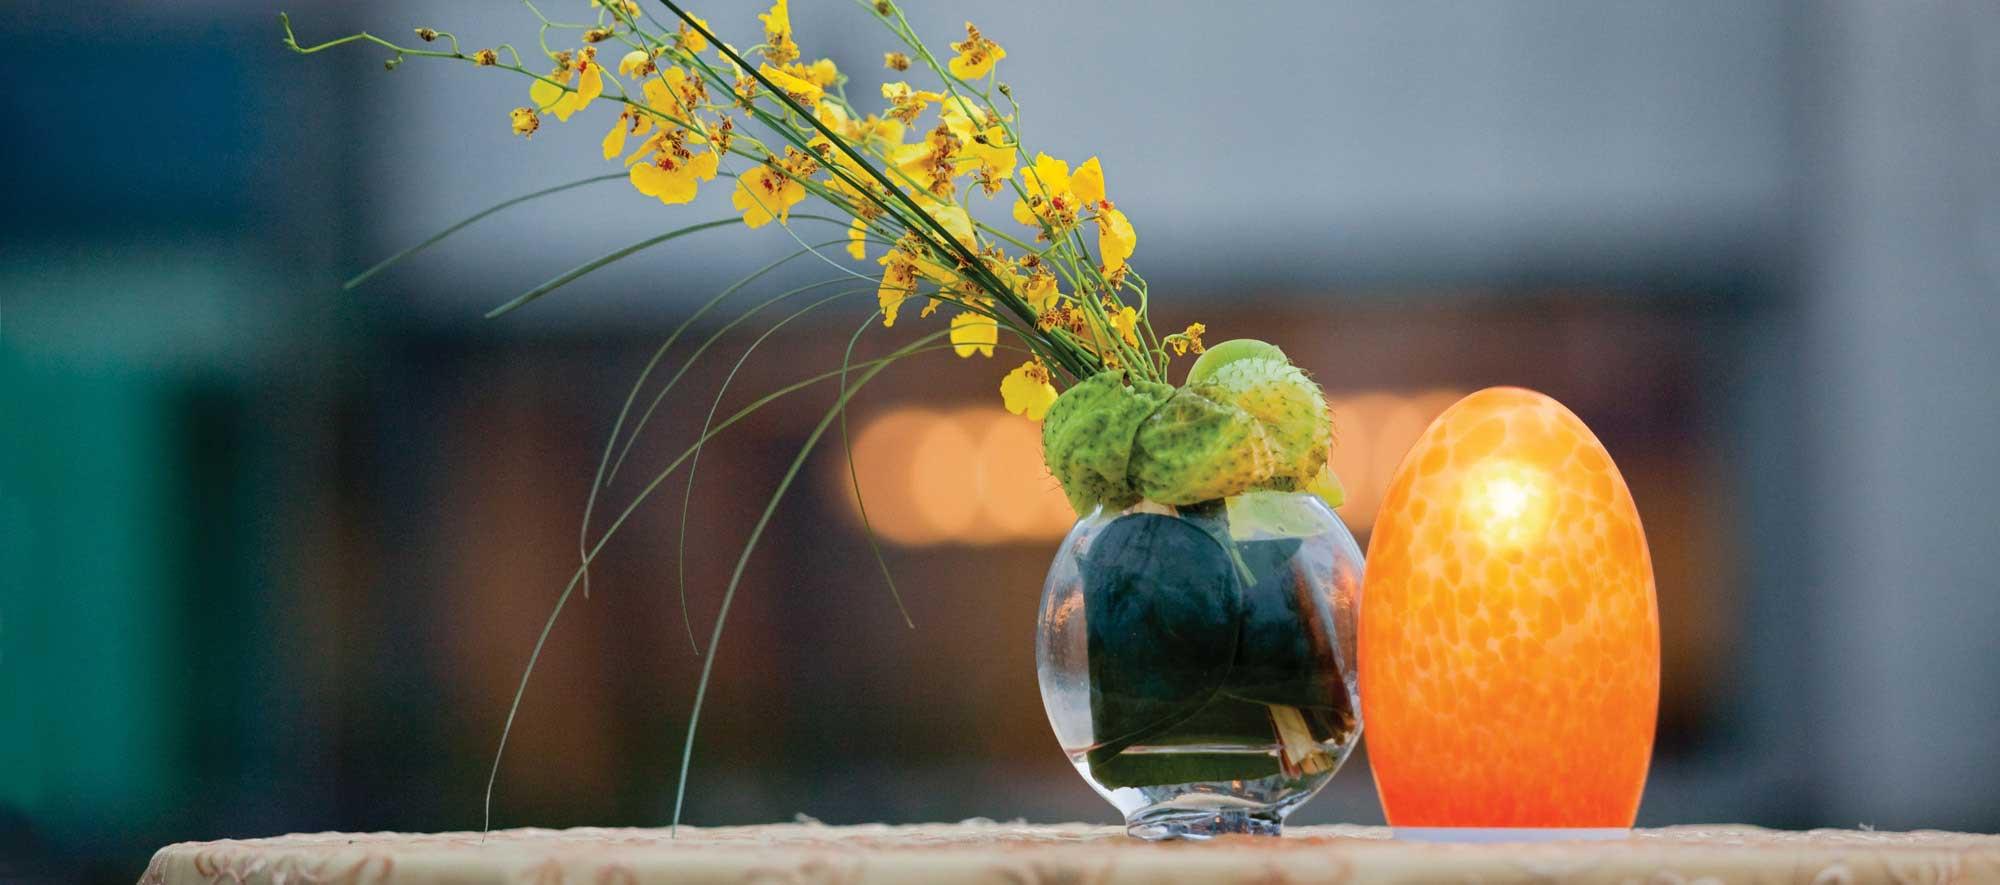 Egg-Fritted-Flower-Saffron